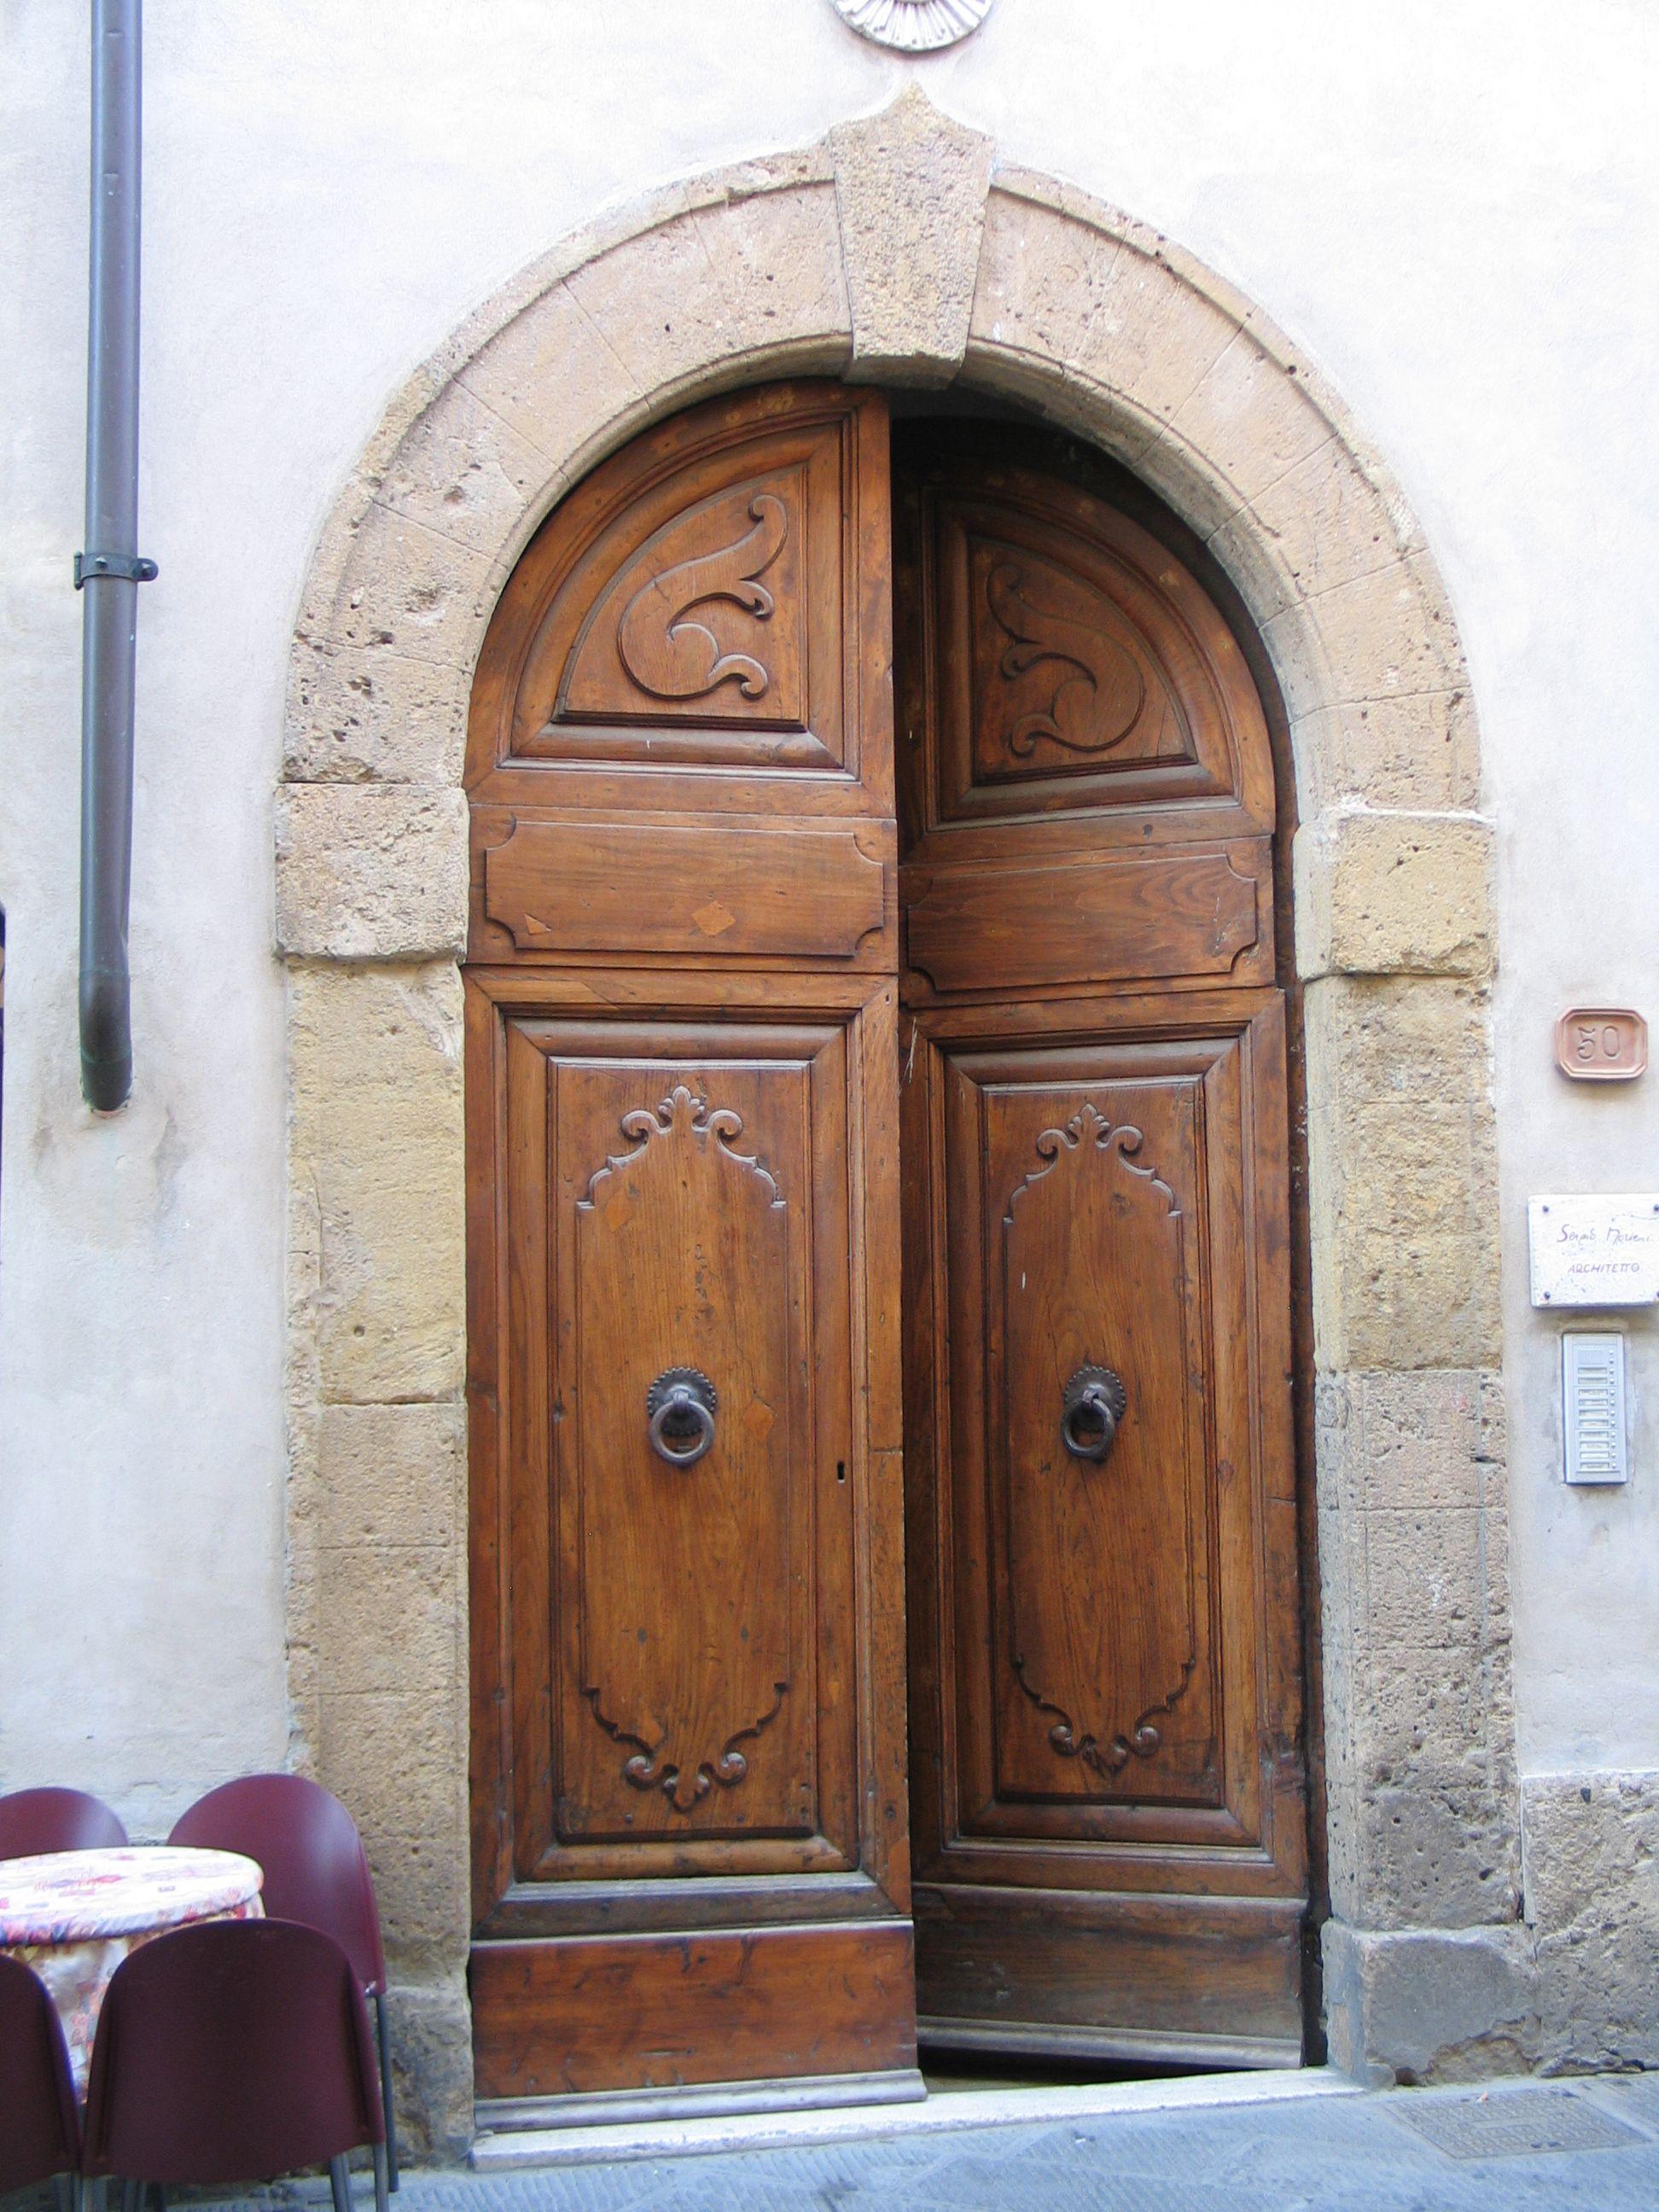 A massive wooden door in San Gimignano, Italy.